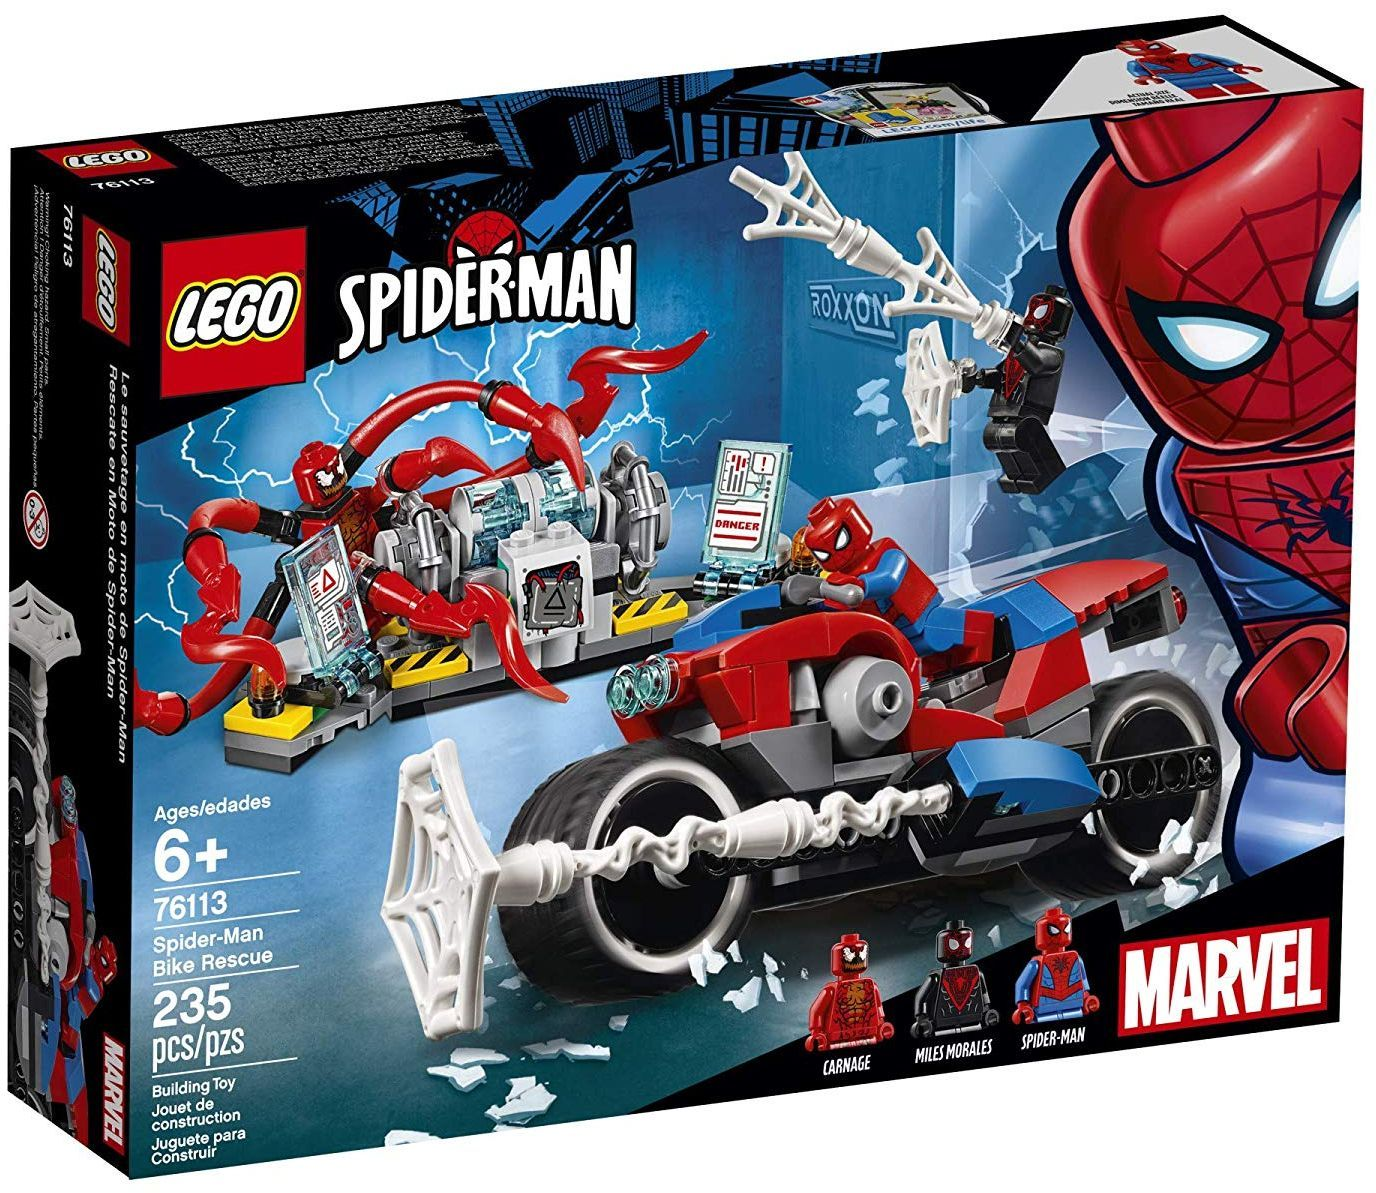 Конструктор Lego Marvel Super Heroes -Spider-Man Bike Rescue (76113) - 4